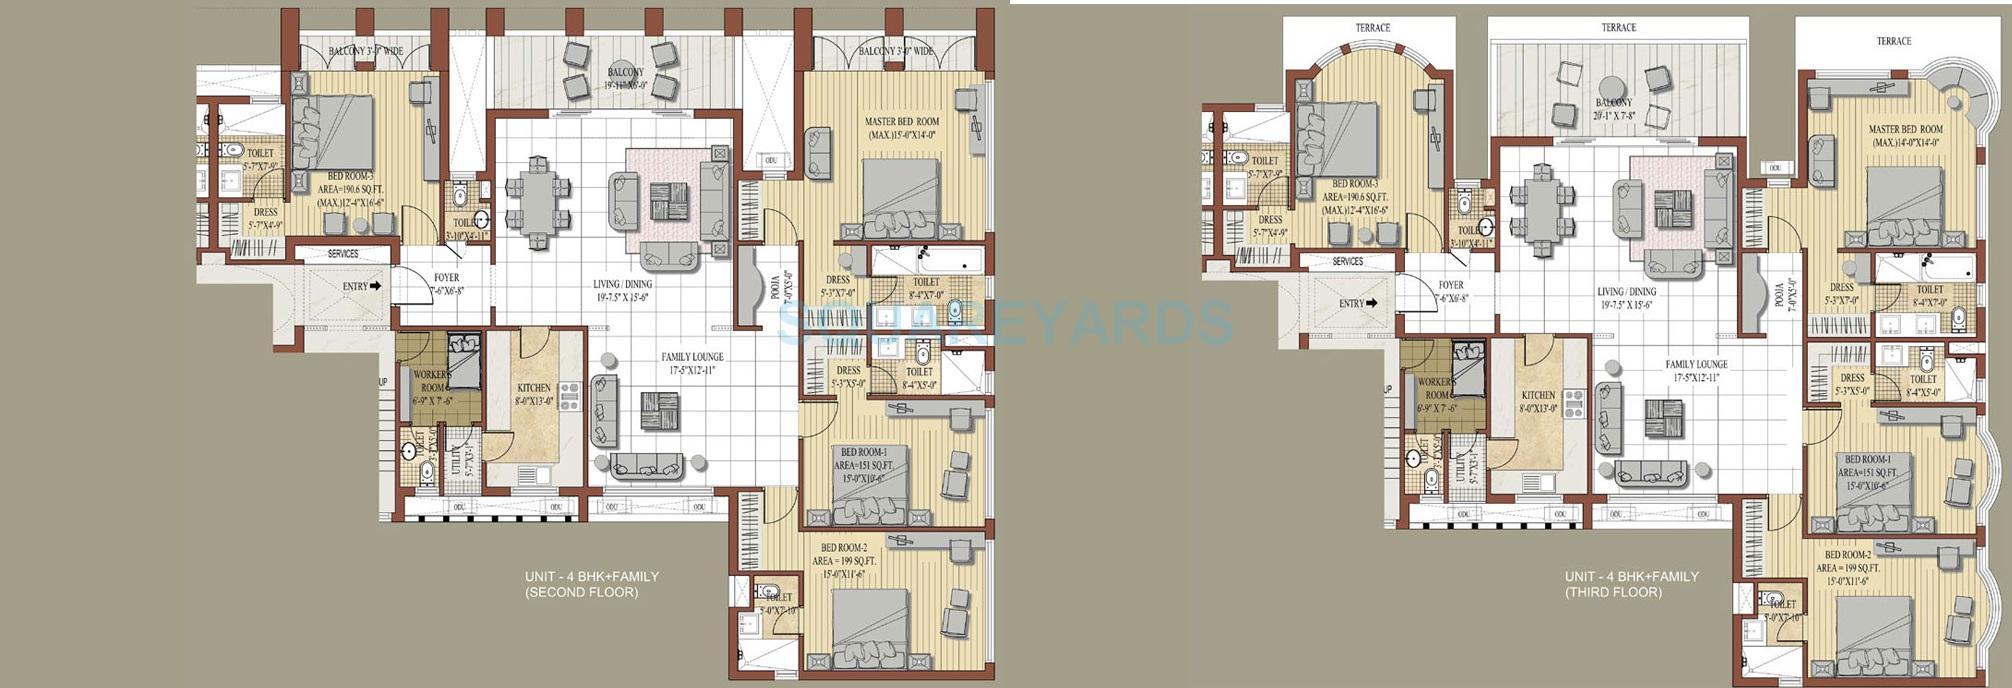 jaypee knight court apartment 4bhk 2950sqft 1